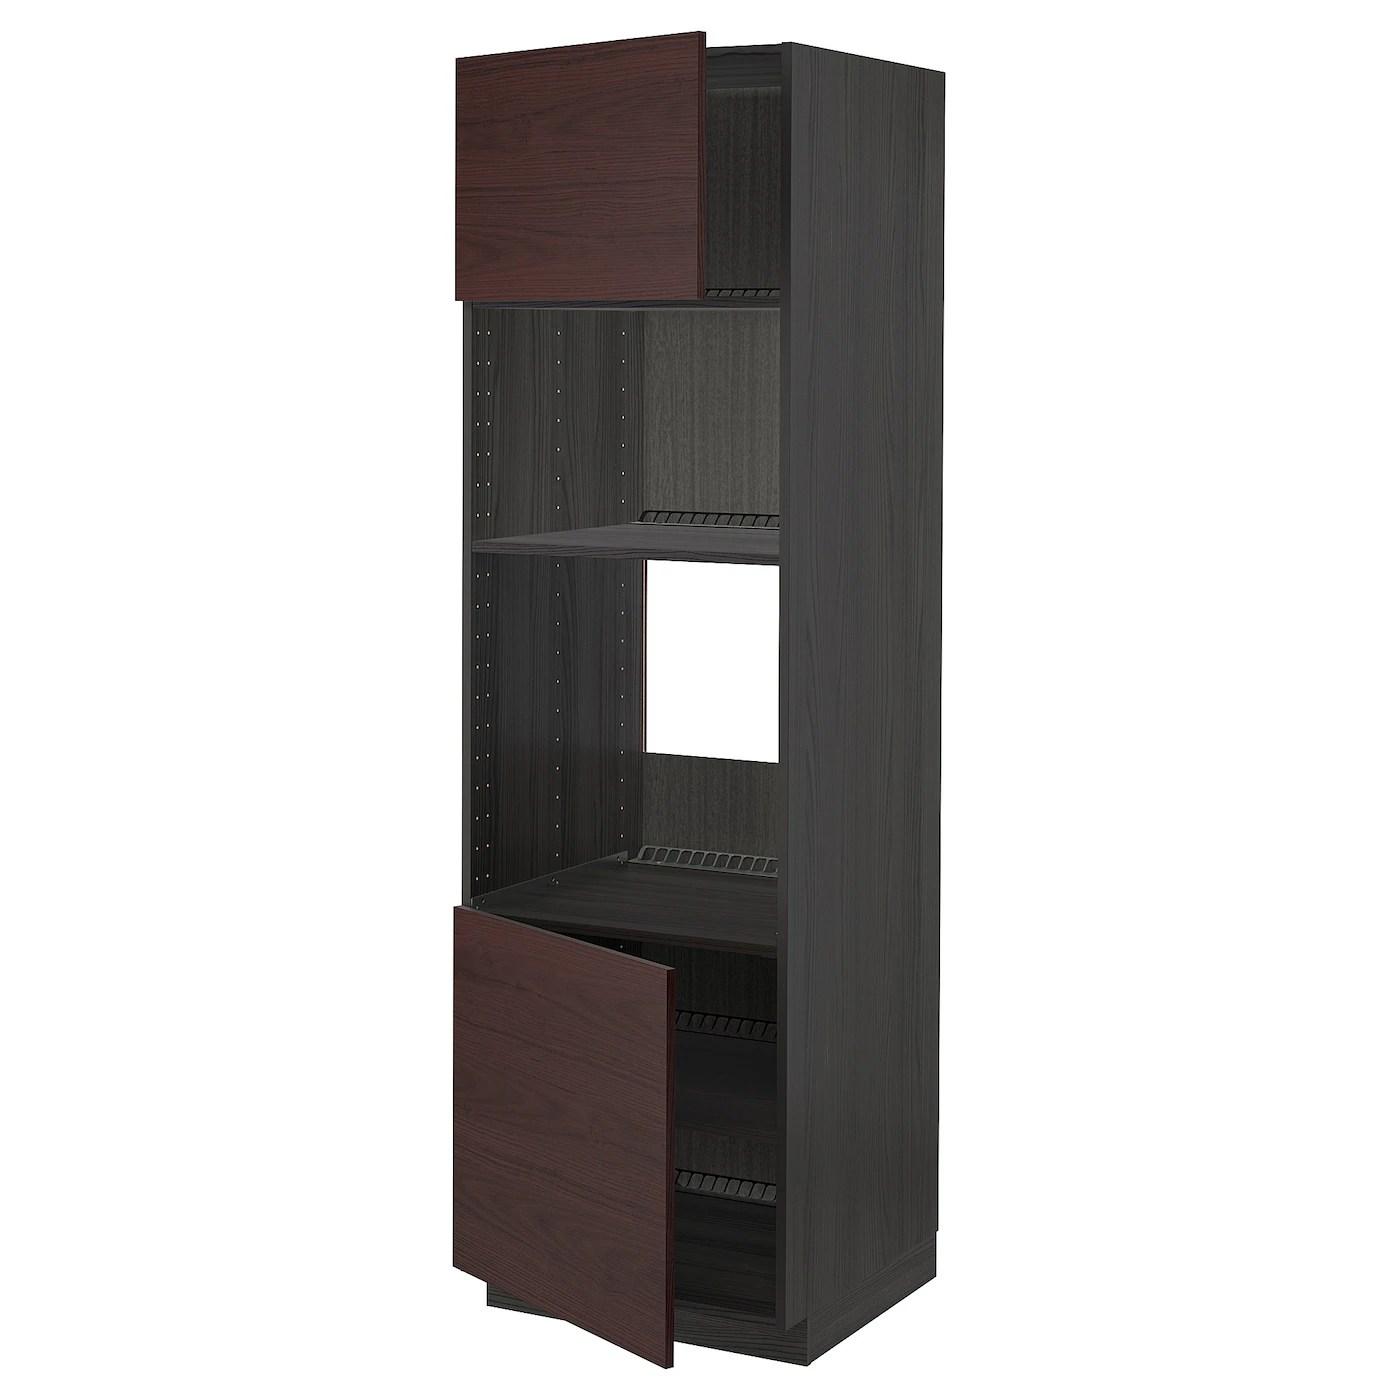 metod armoire four micro ondes 2portes tb noir askersund brun fonce decor frene 60x60x200 cm